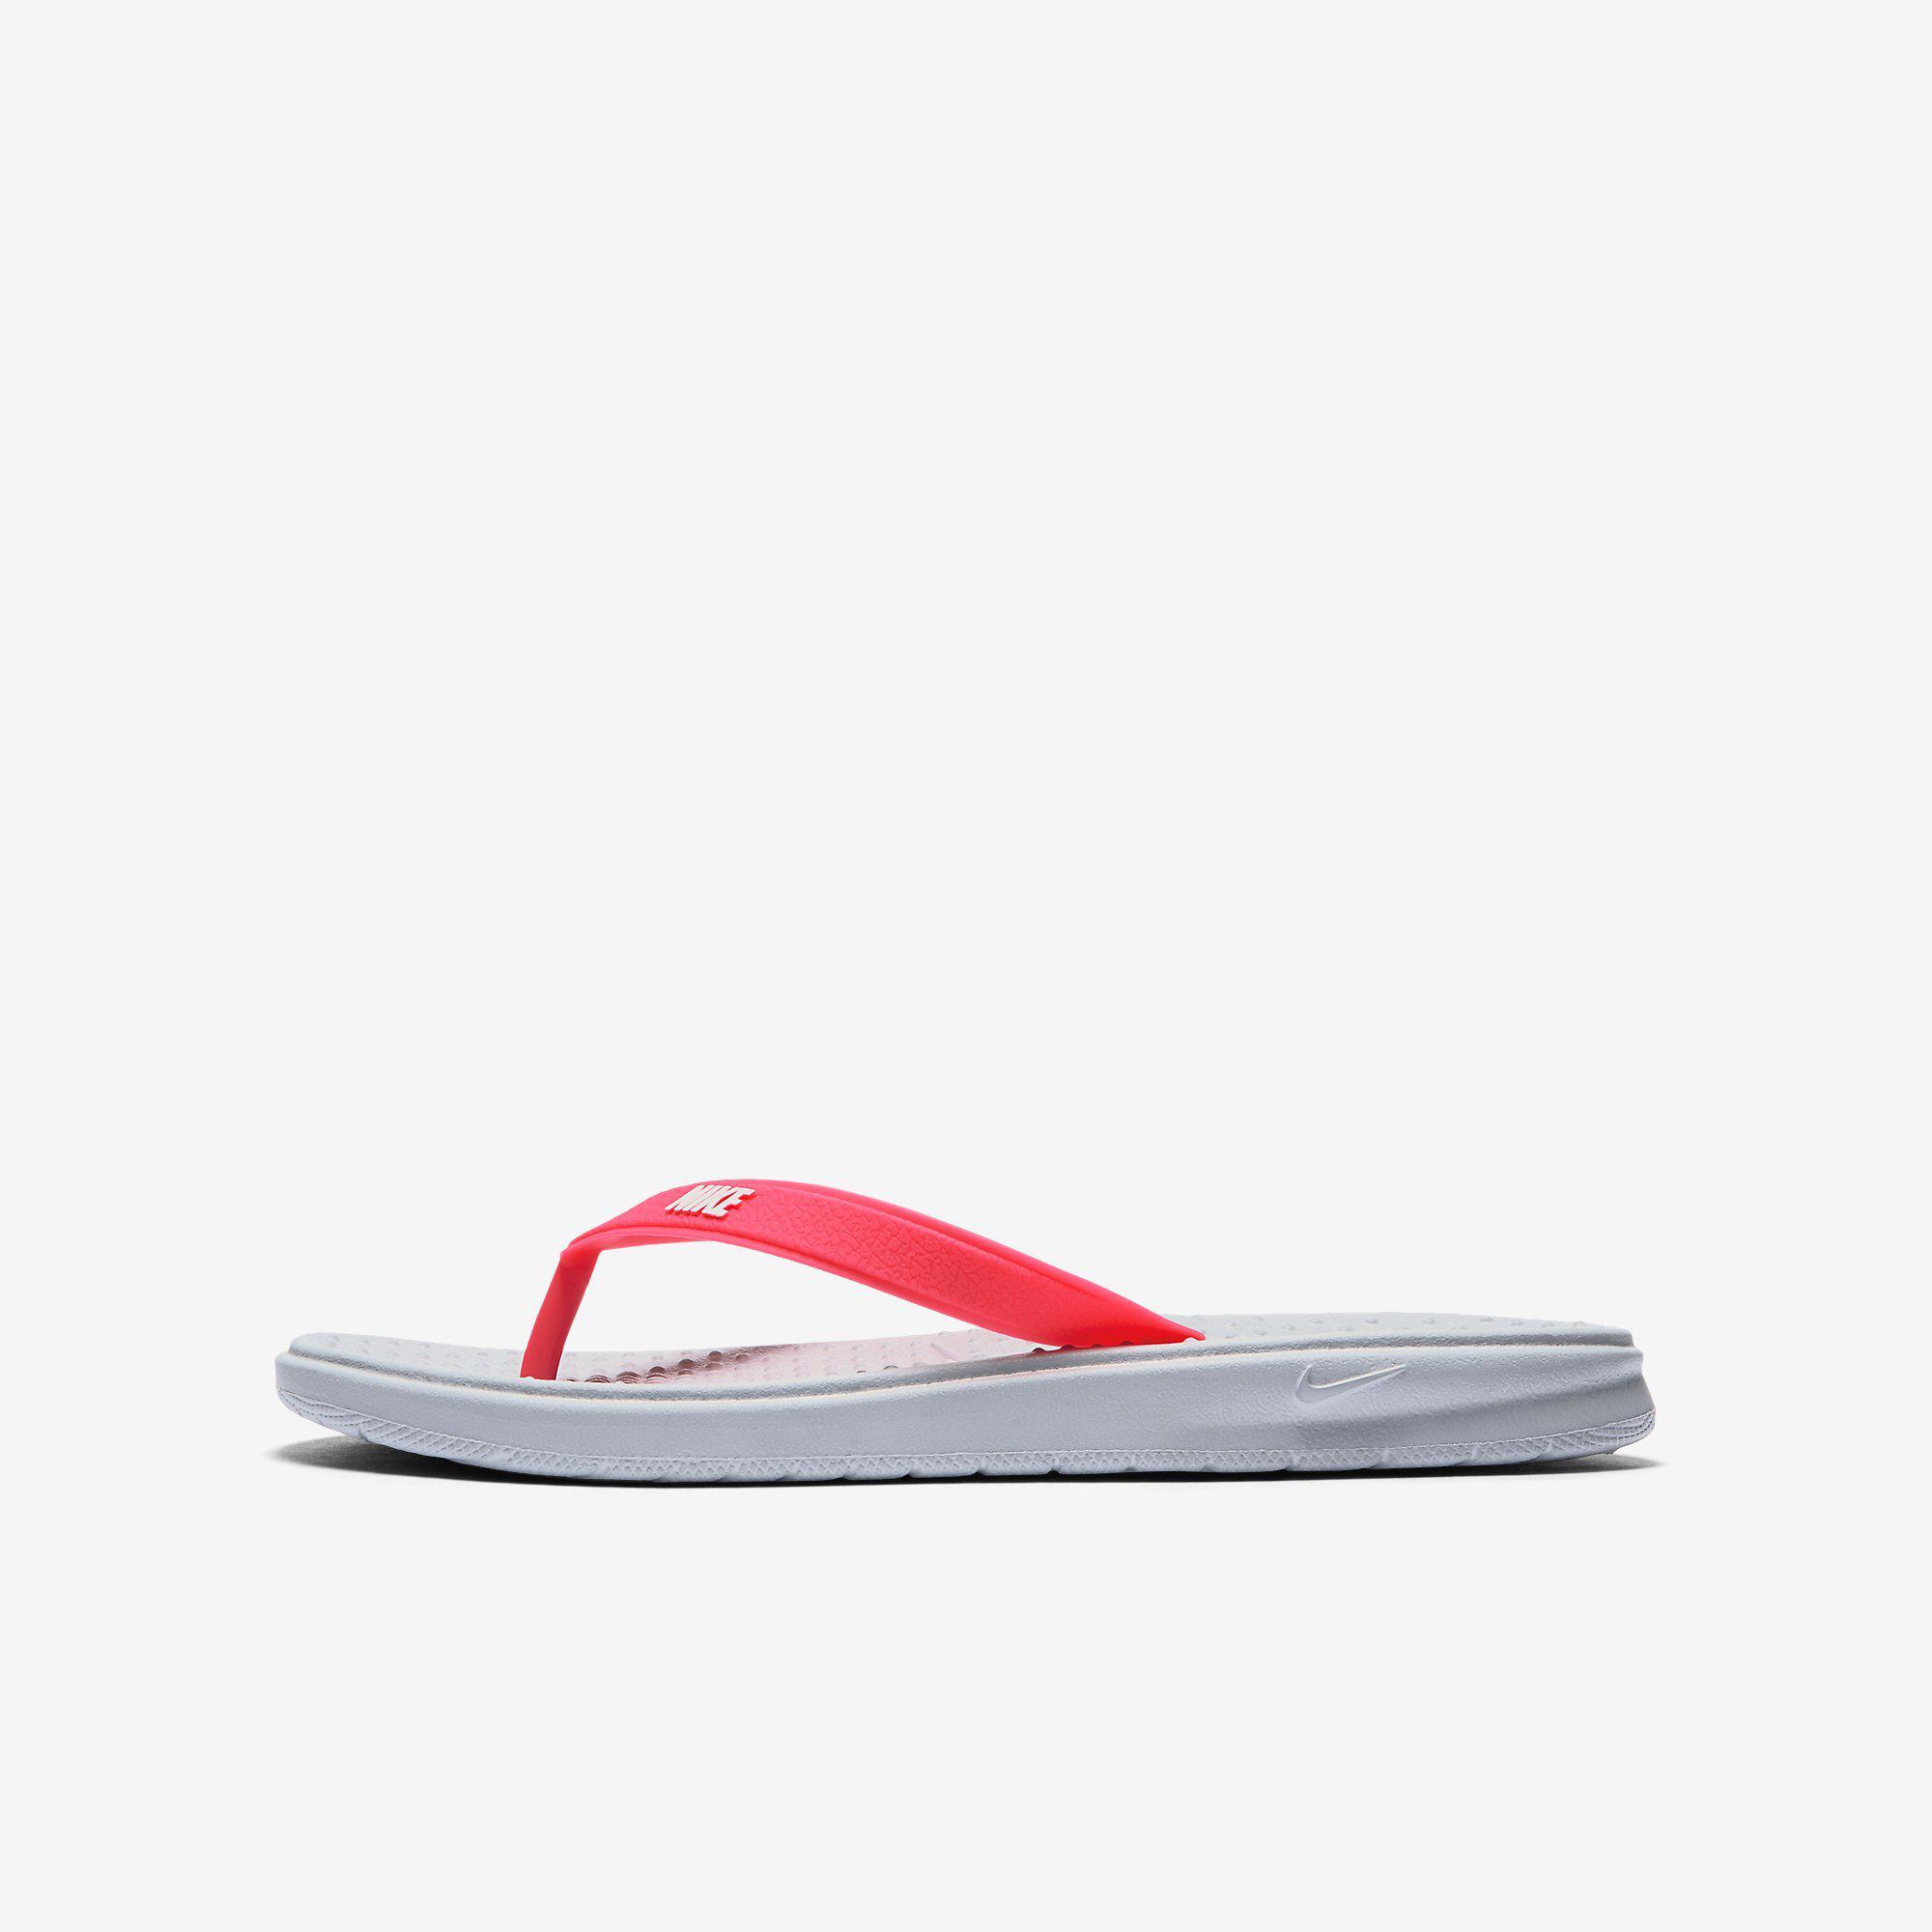 64fe91102 Nike Girls Solay Thong (Flip Flops) - Wolf Grey Racer Pink - Tennisnuts.com